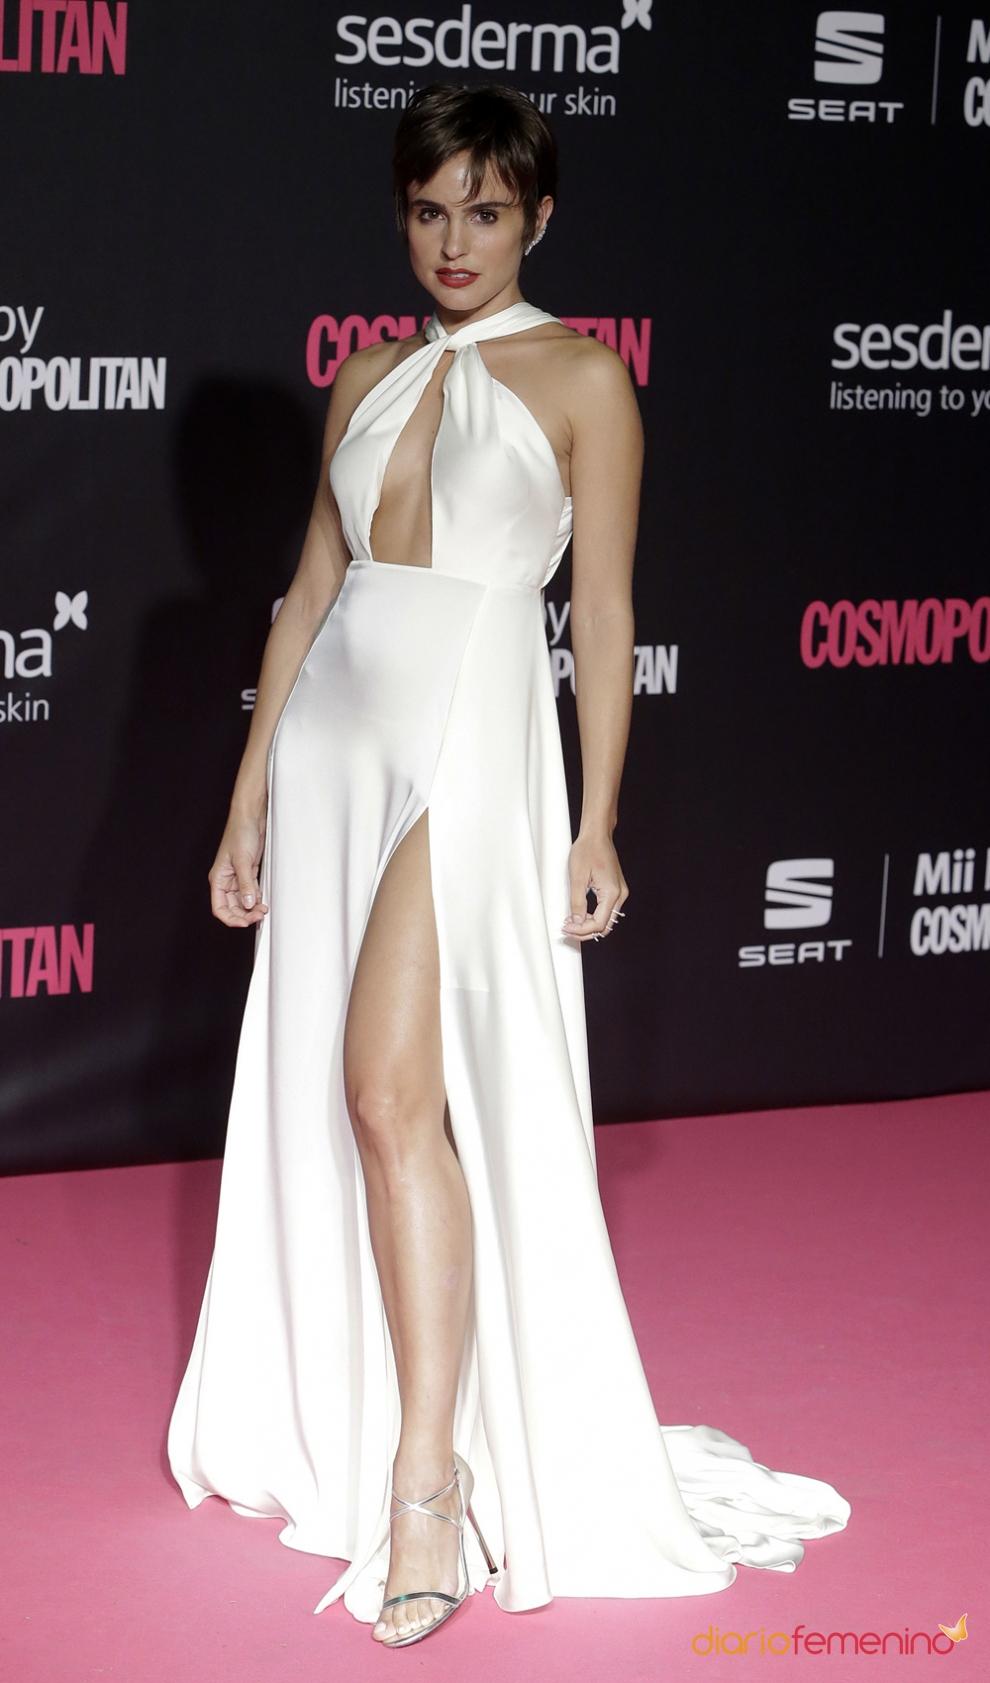 Blanca Suárez Beauty Rules - Bikini Luxe